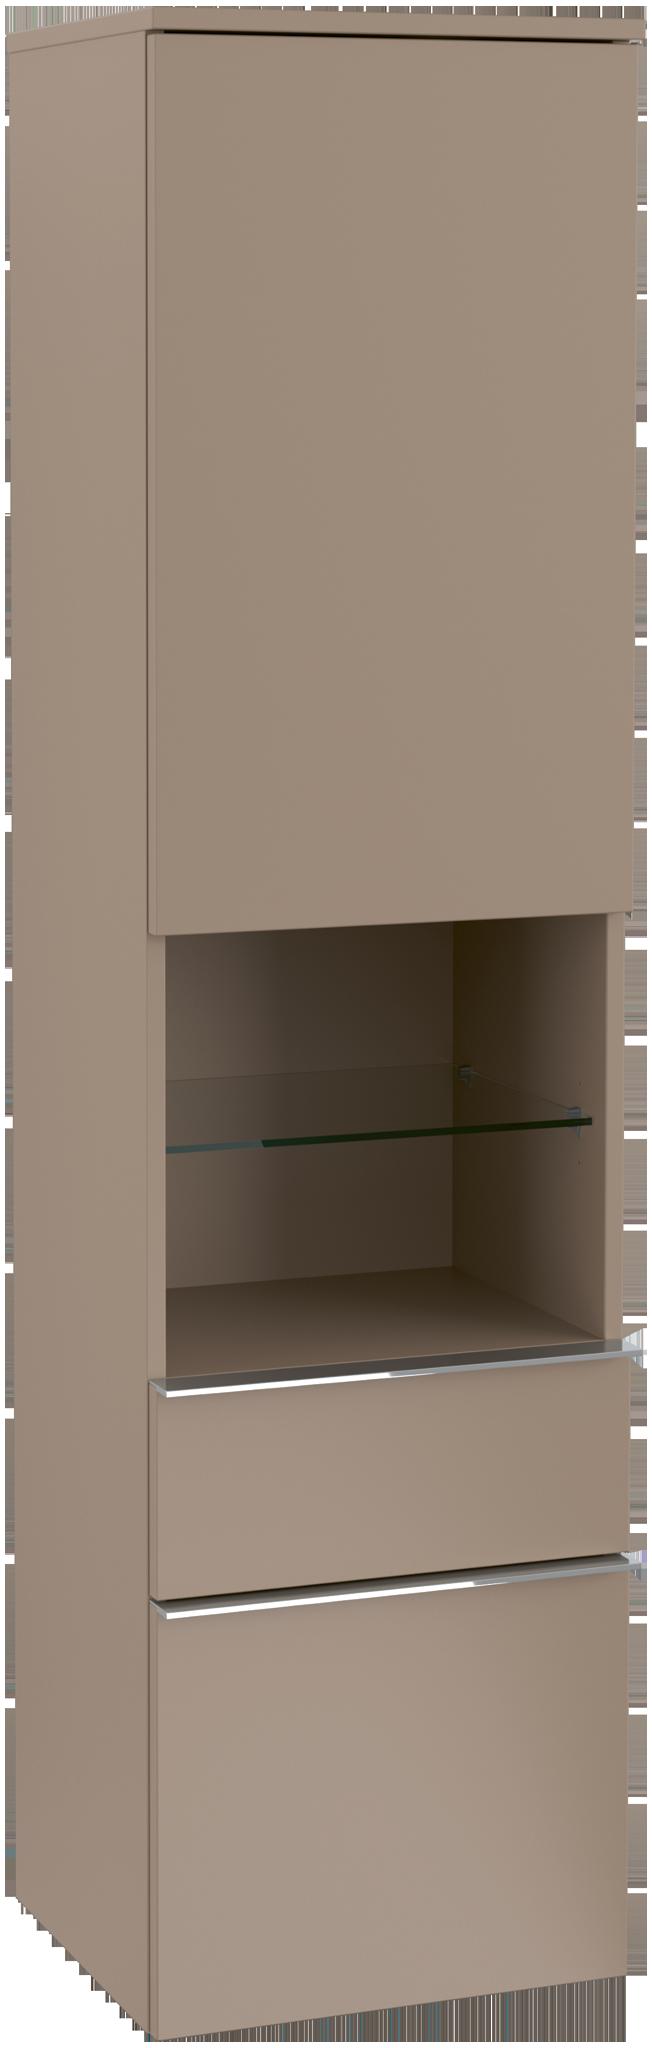 Tall cabinet. Venticello Tall cabinet A95214   Villeroy   Boch